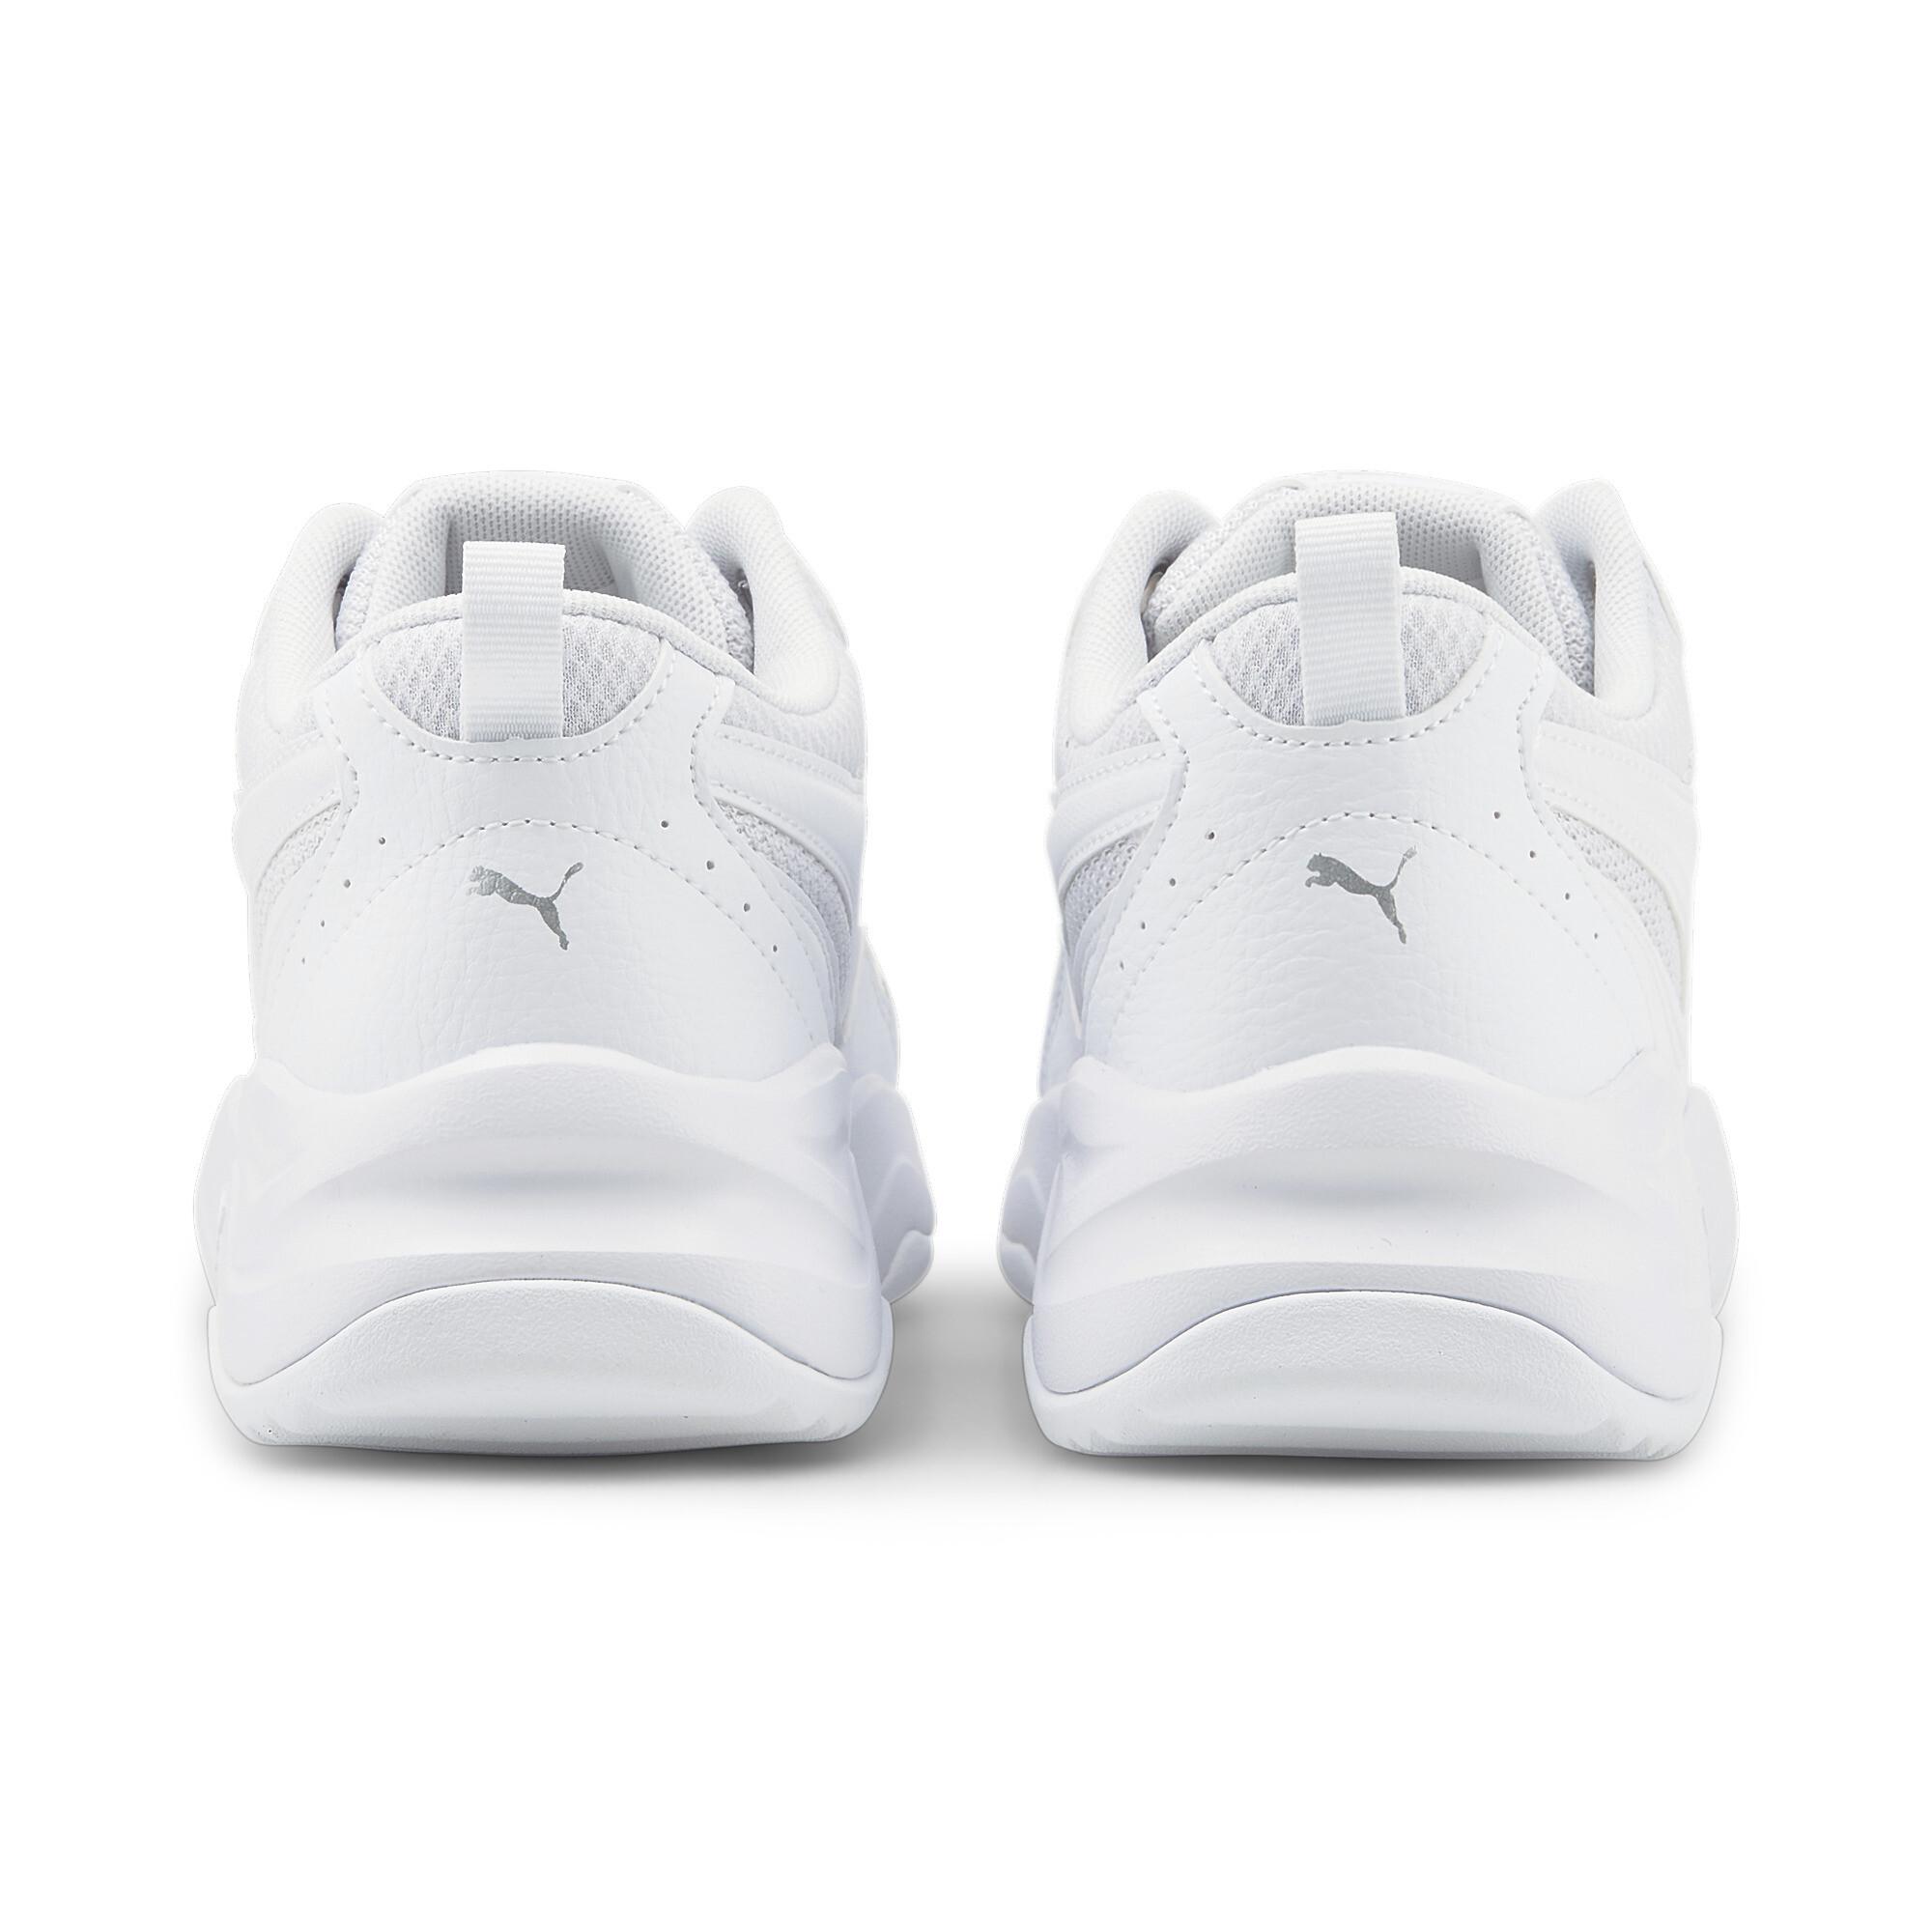 PUMA-Cilia-Women-039-s-Sneakers-Women-Shoe-Basics thumbnail 15